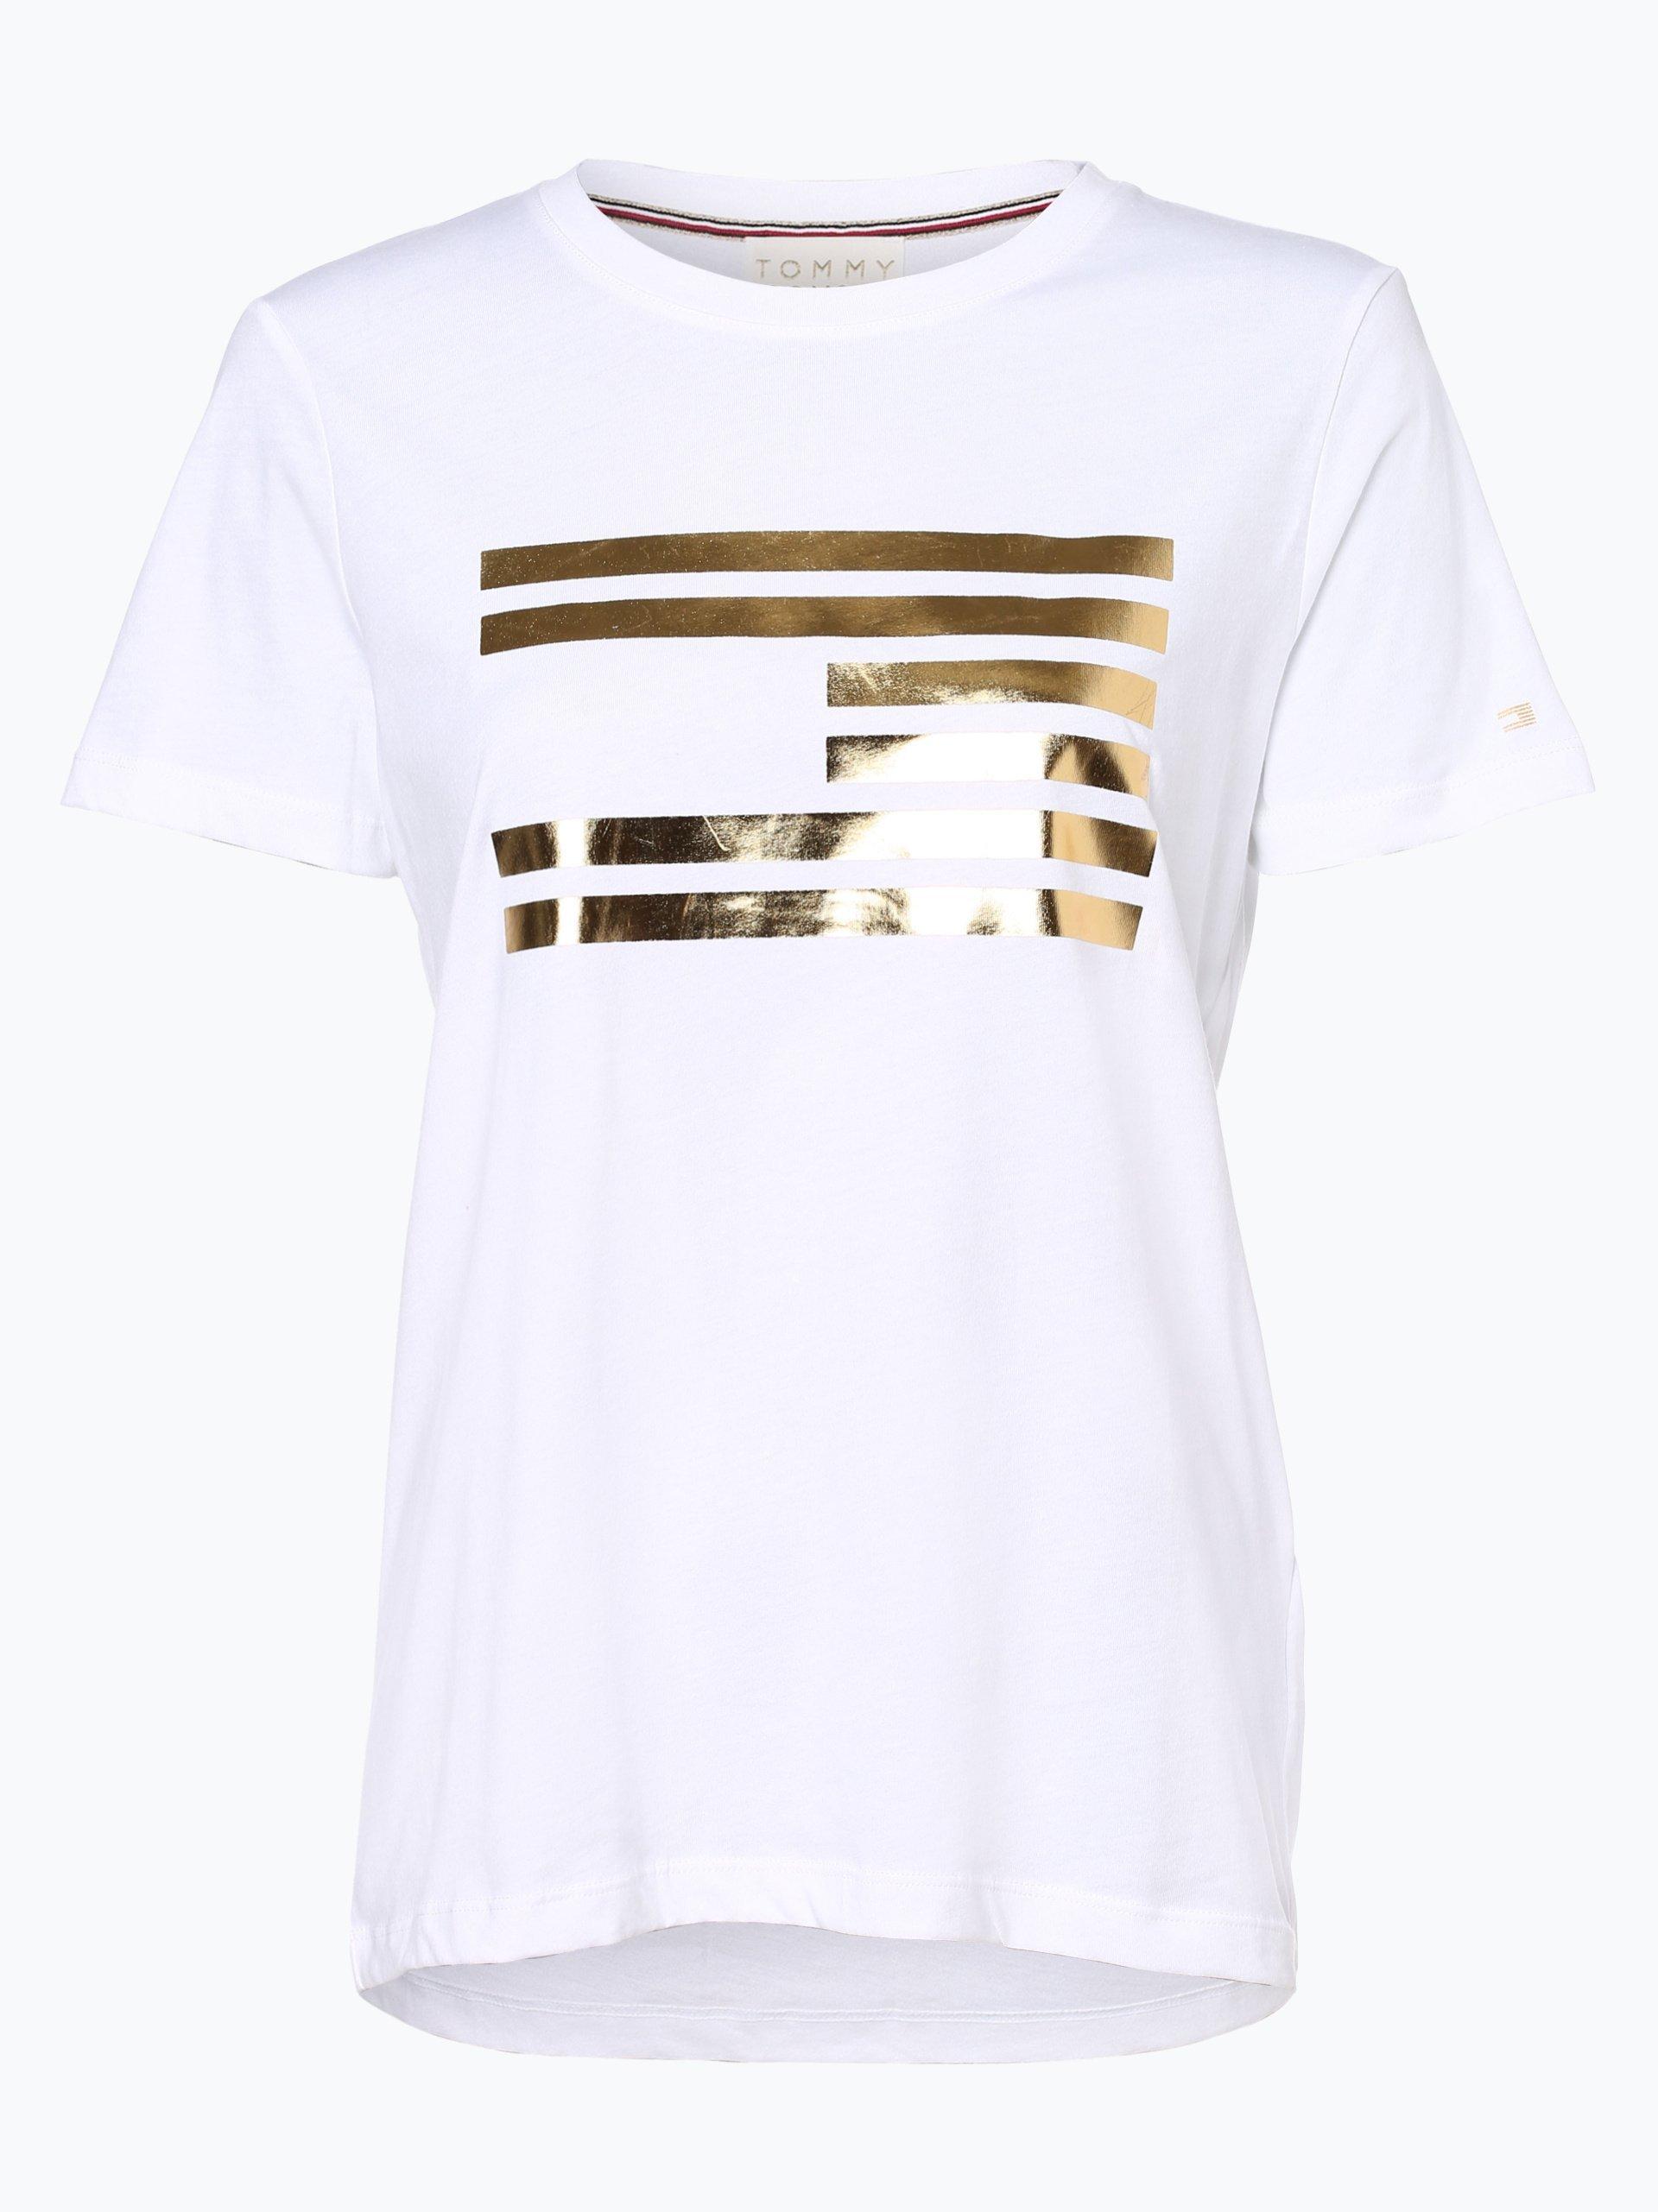 tommy hilfiger damen t shirt icon gold online kaufen. Black Bedroom Furniture Sets. Home Design Ideas